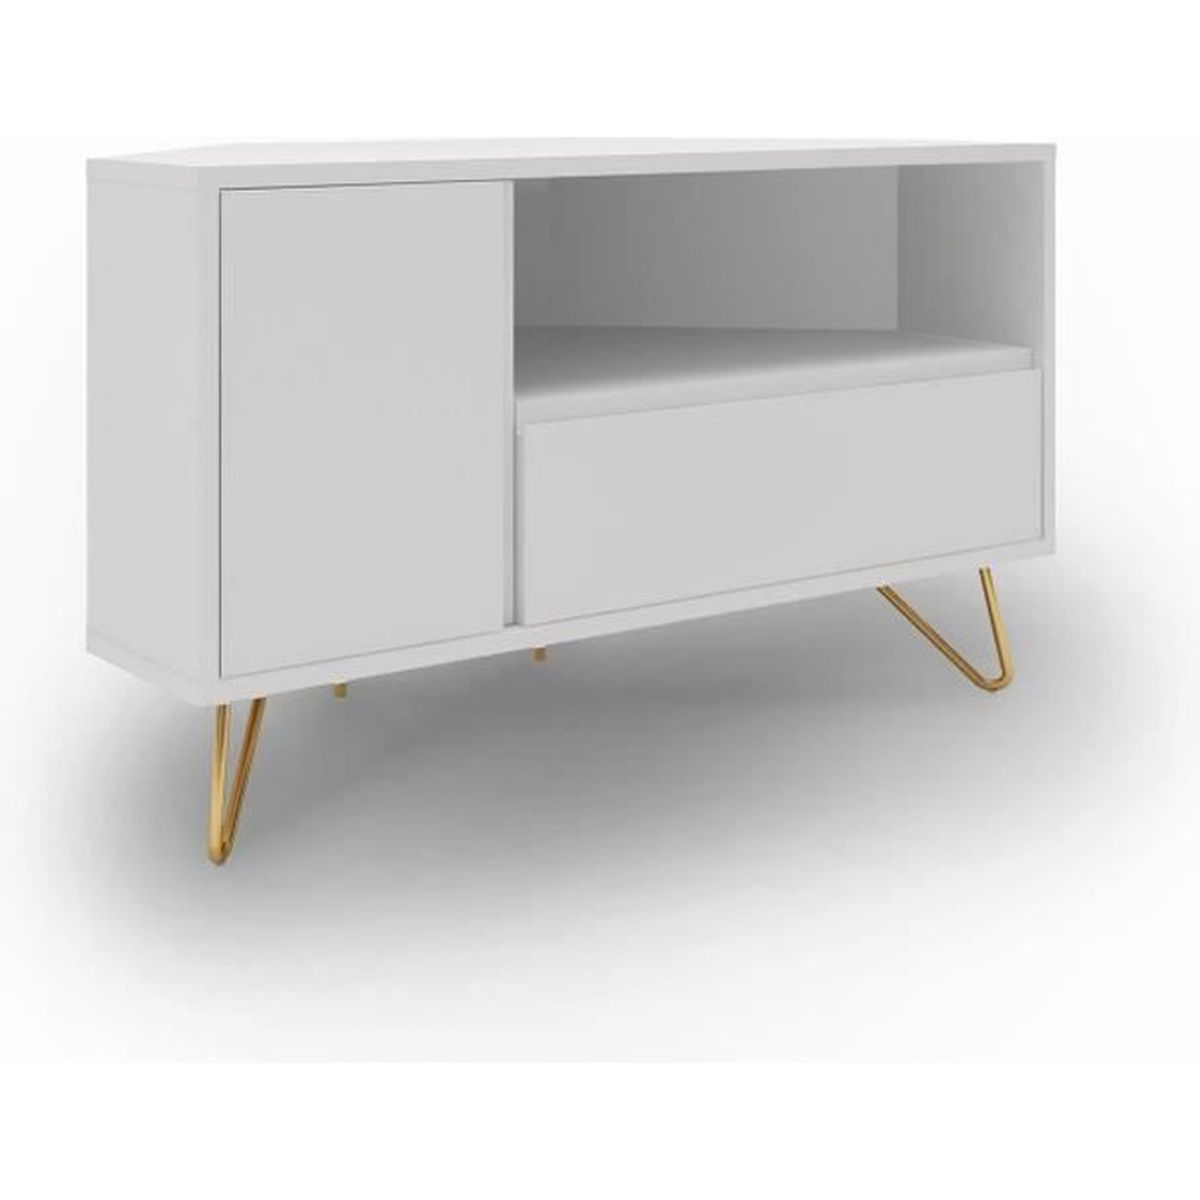 Meuble Tv Angle Suspendu meuble tv d'angle blanc darina - achat / vente meuble tv